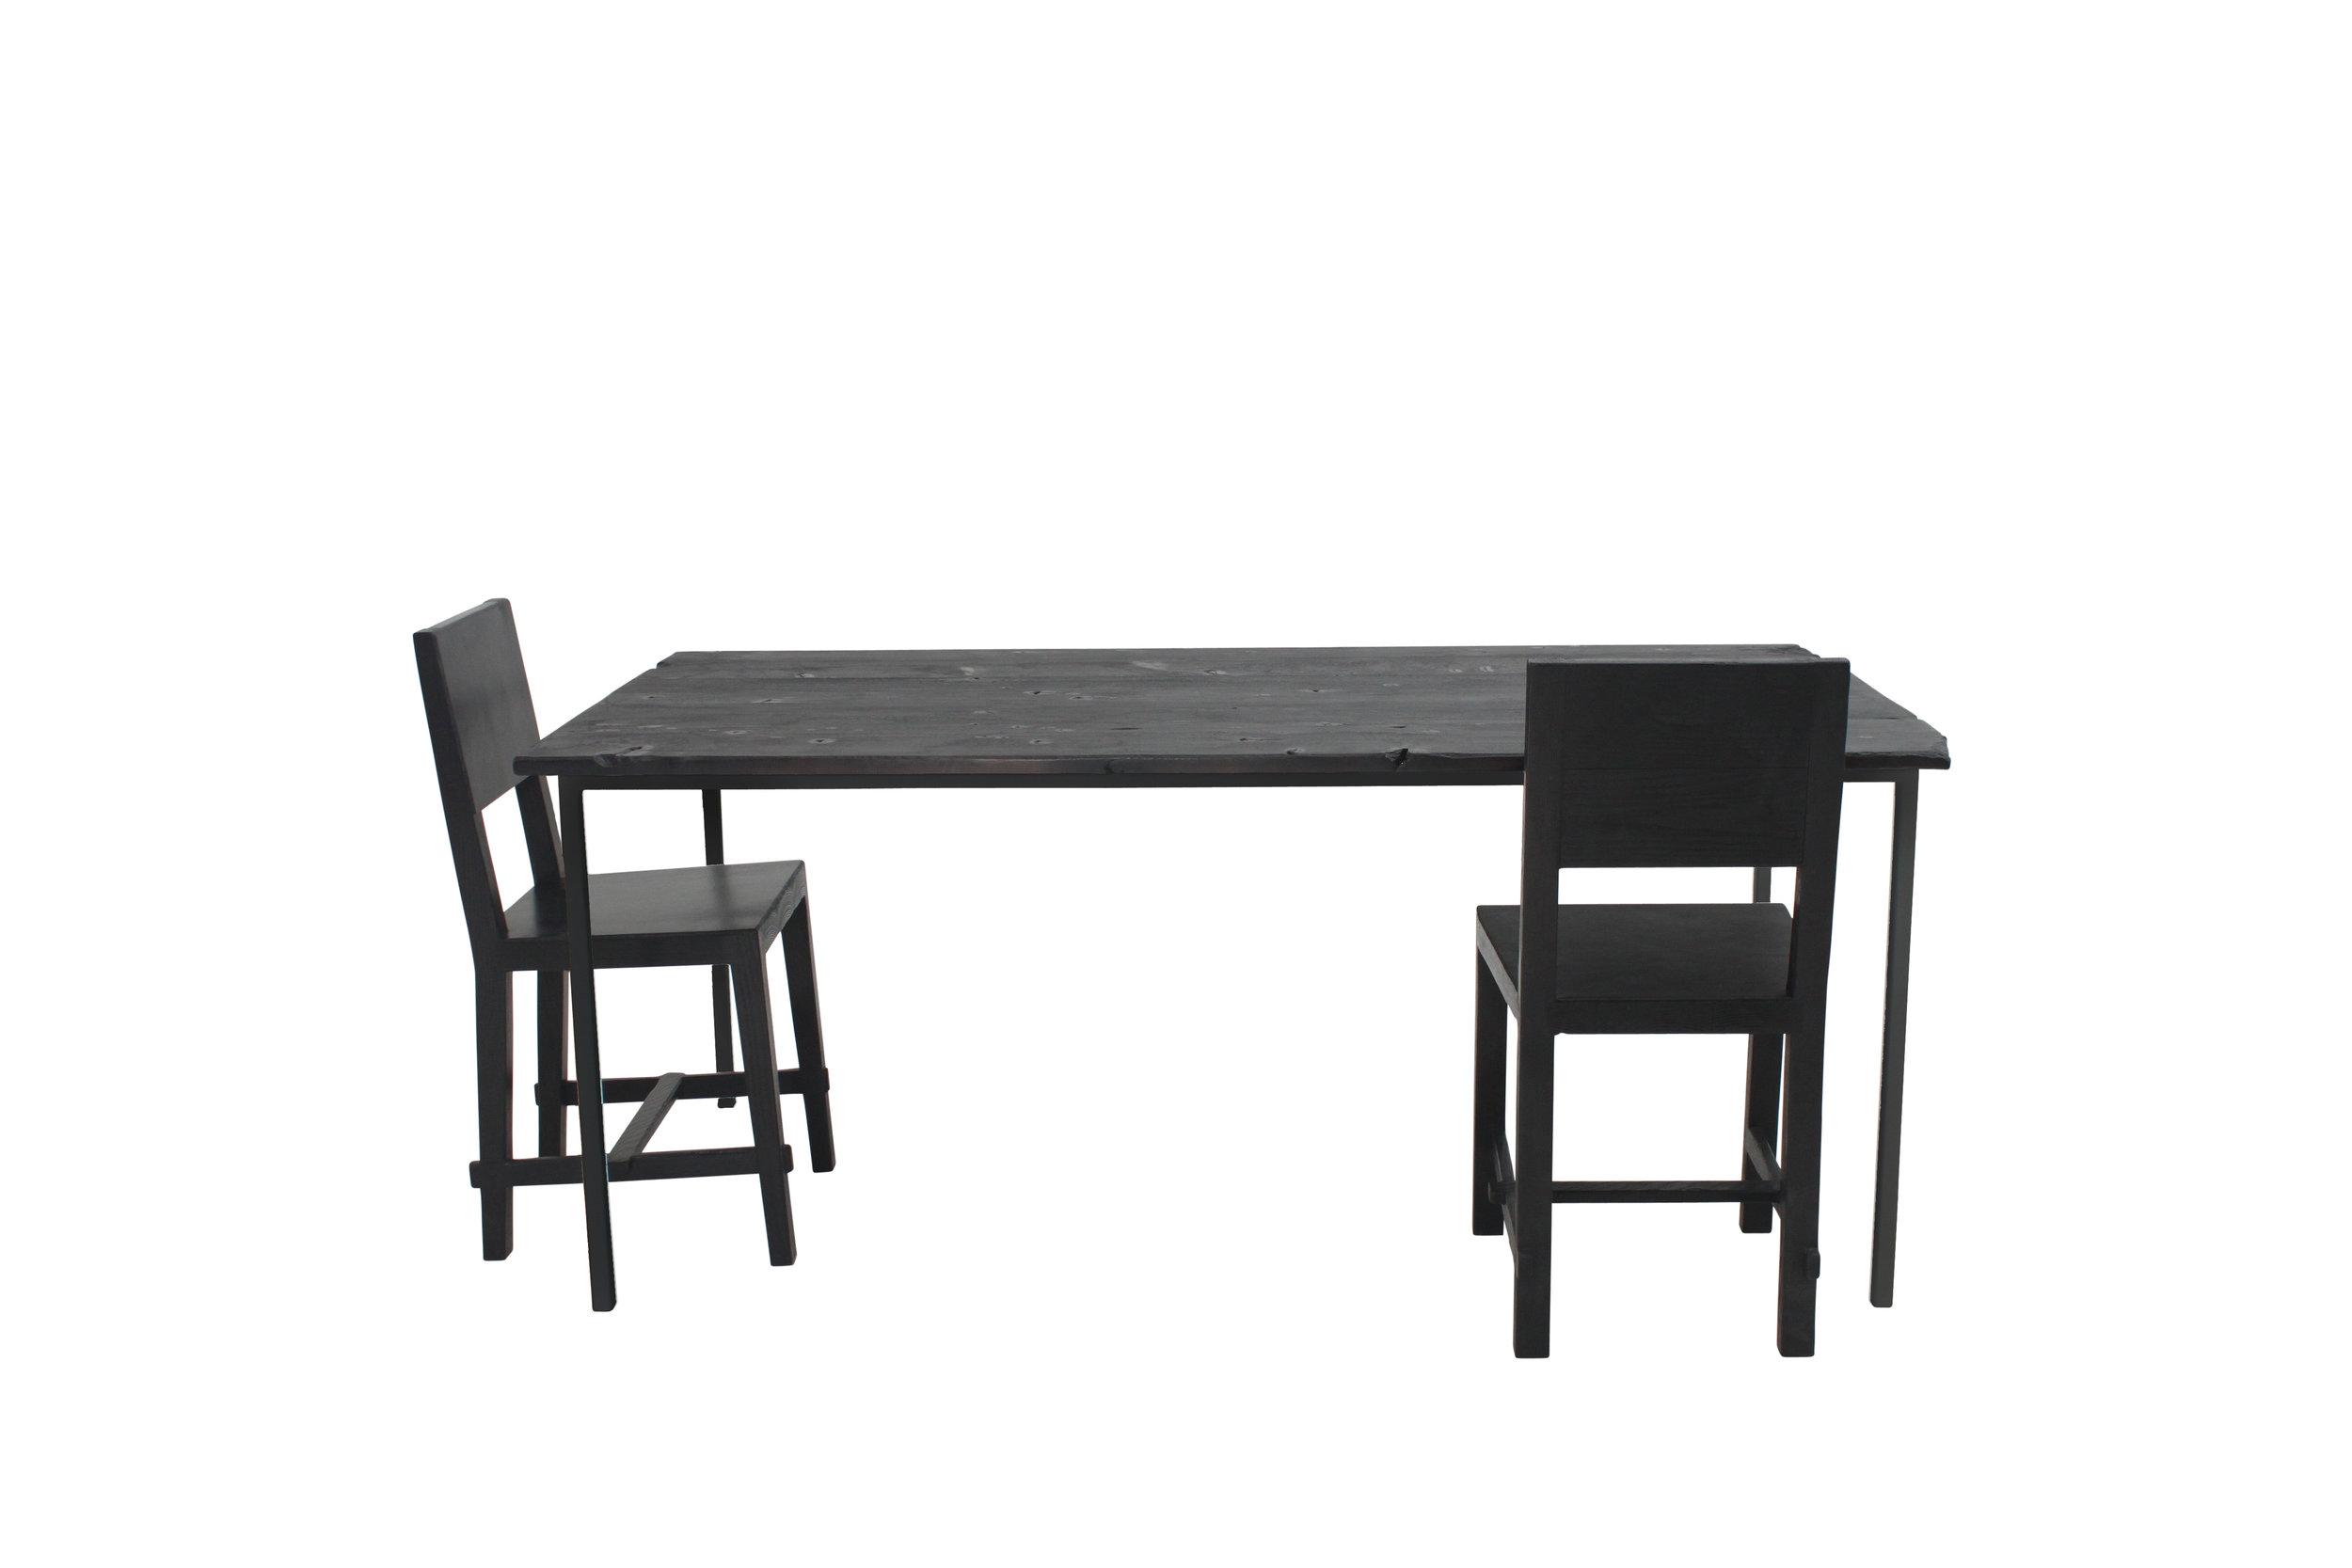 Hephaestus Table_Charred7 black base copy.jpg